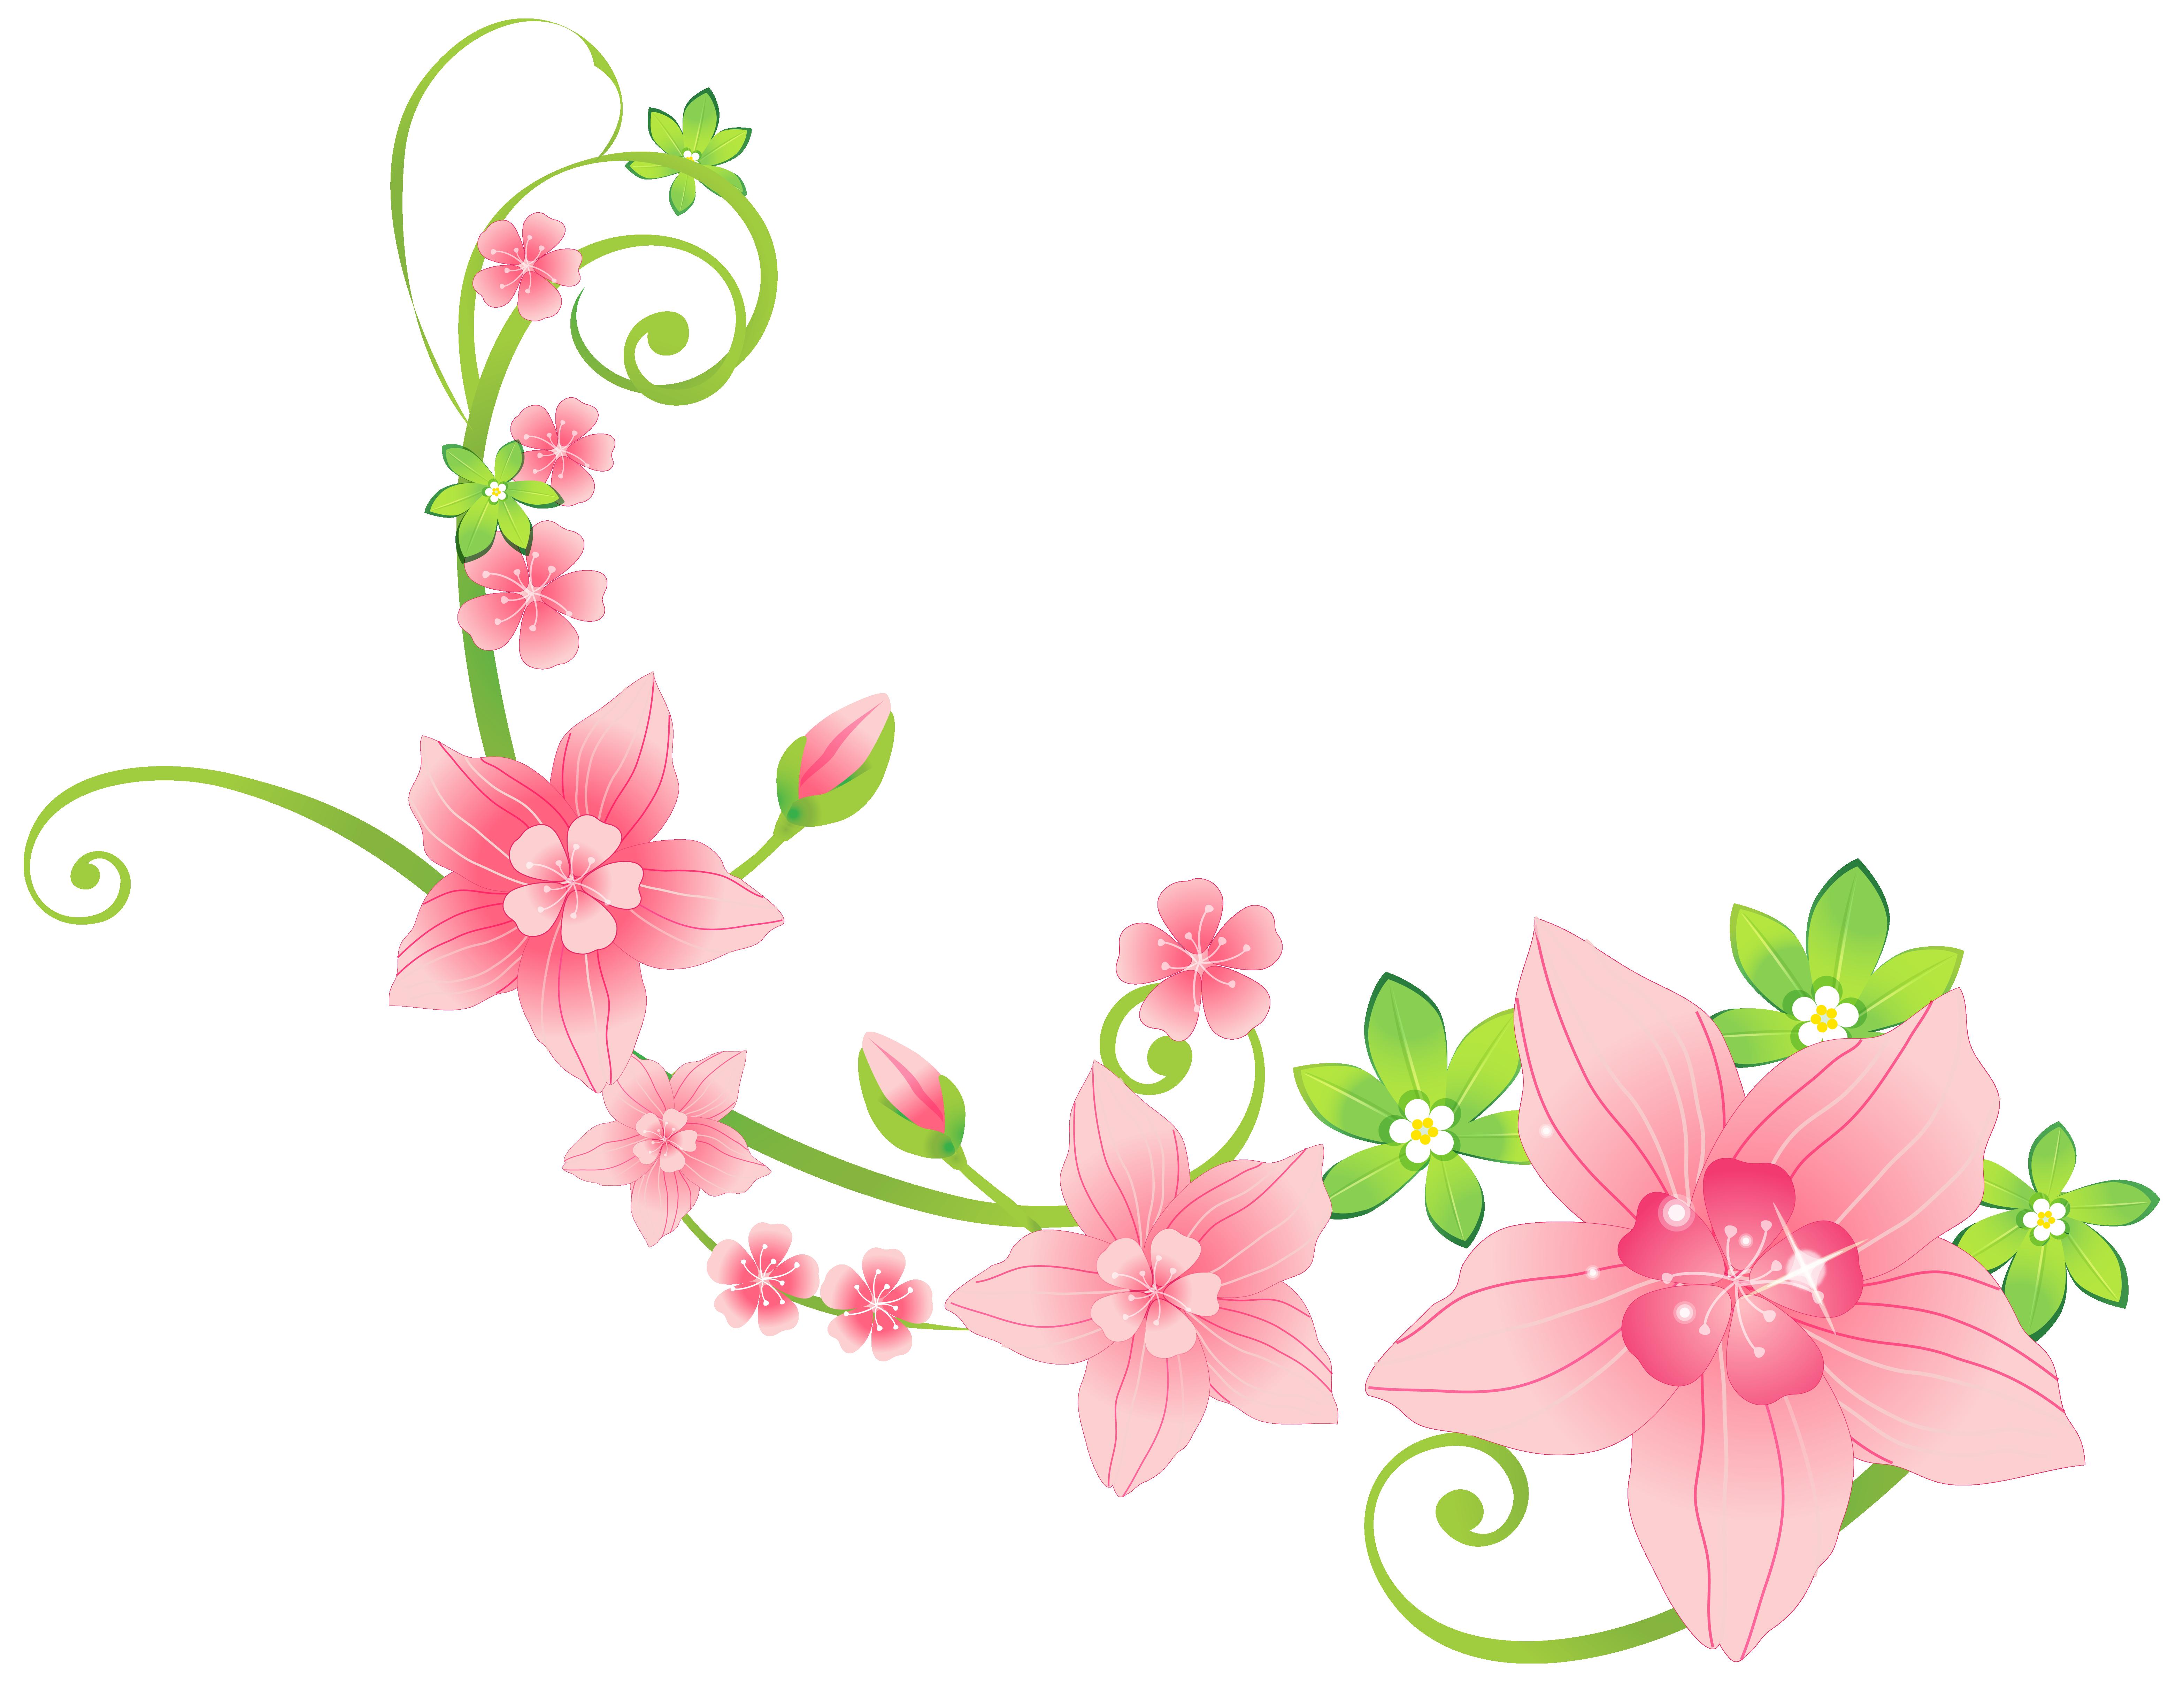 Floral png transparent images. Clipart flower aesthetic